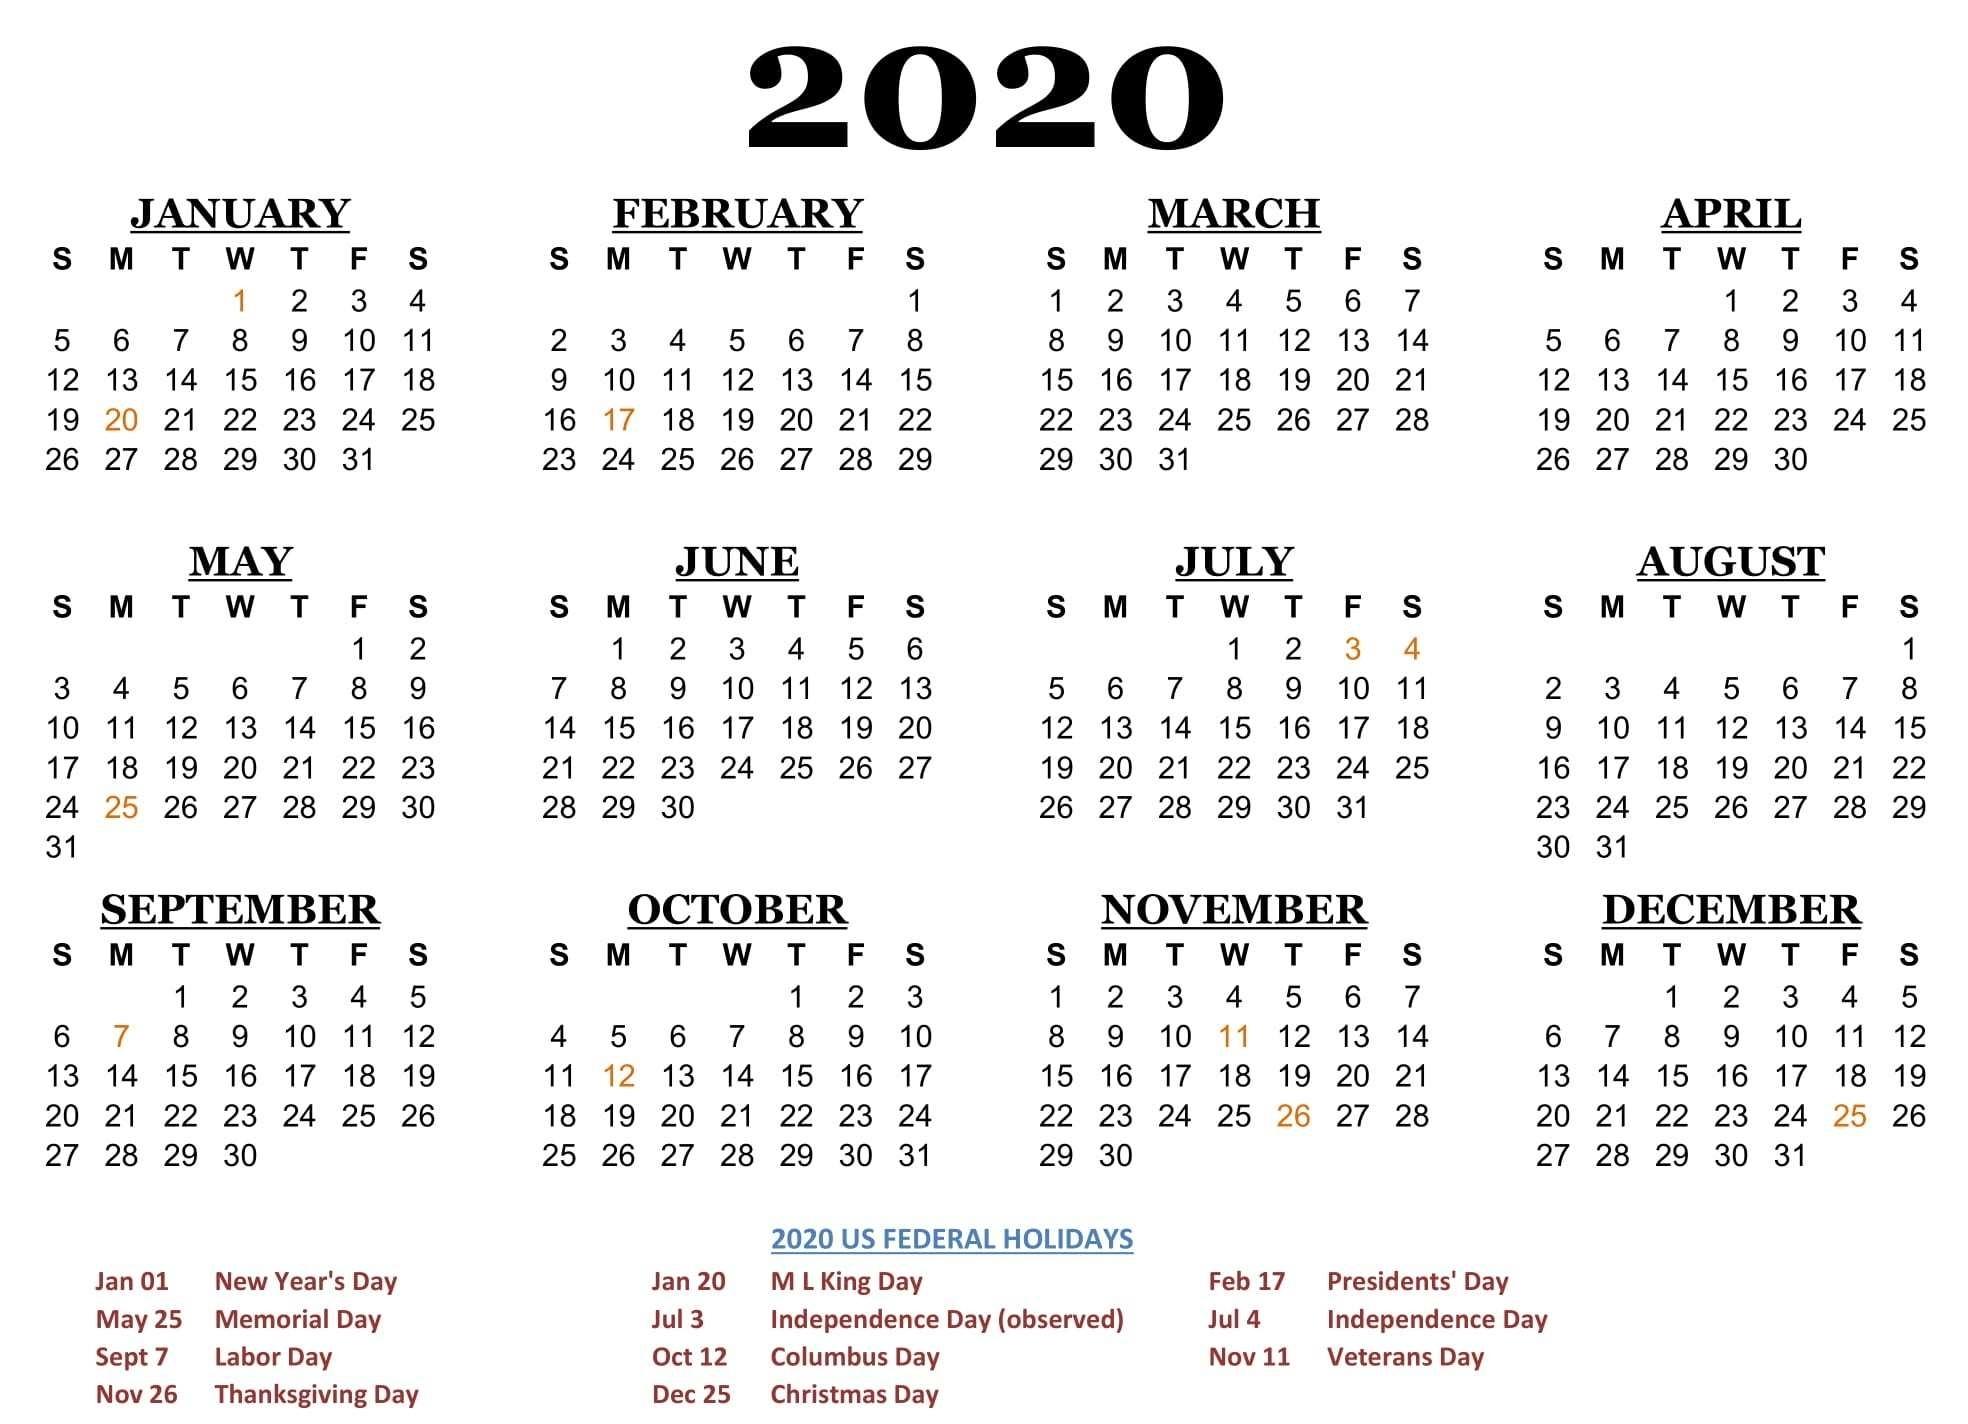 2020 One Page Calendar Printable Download | Calendarbuzz